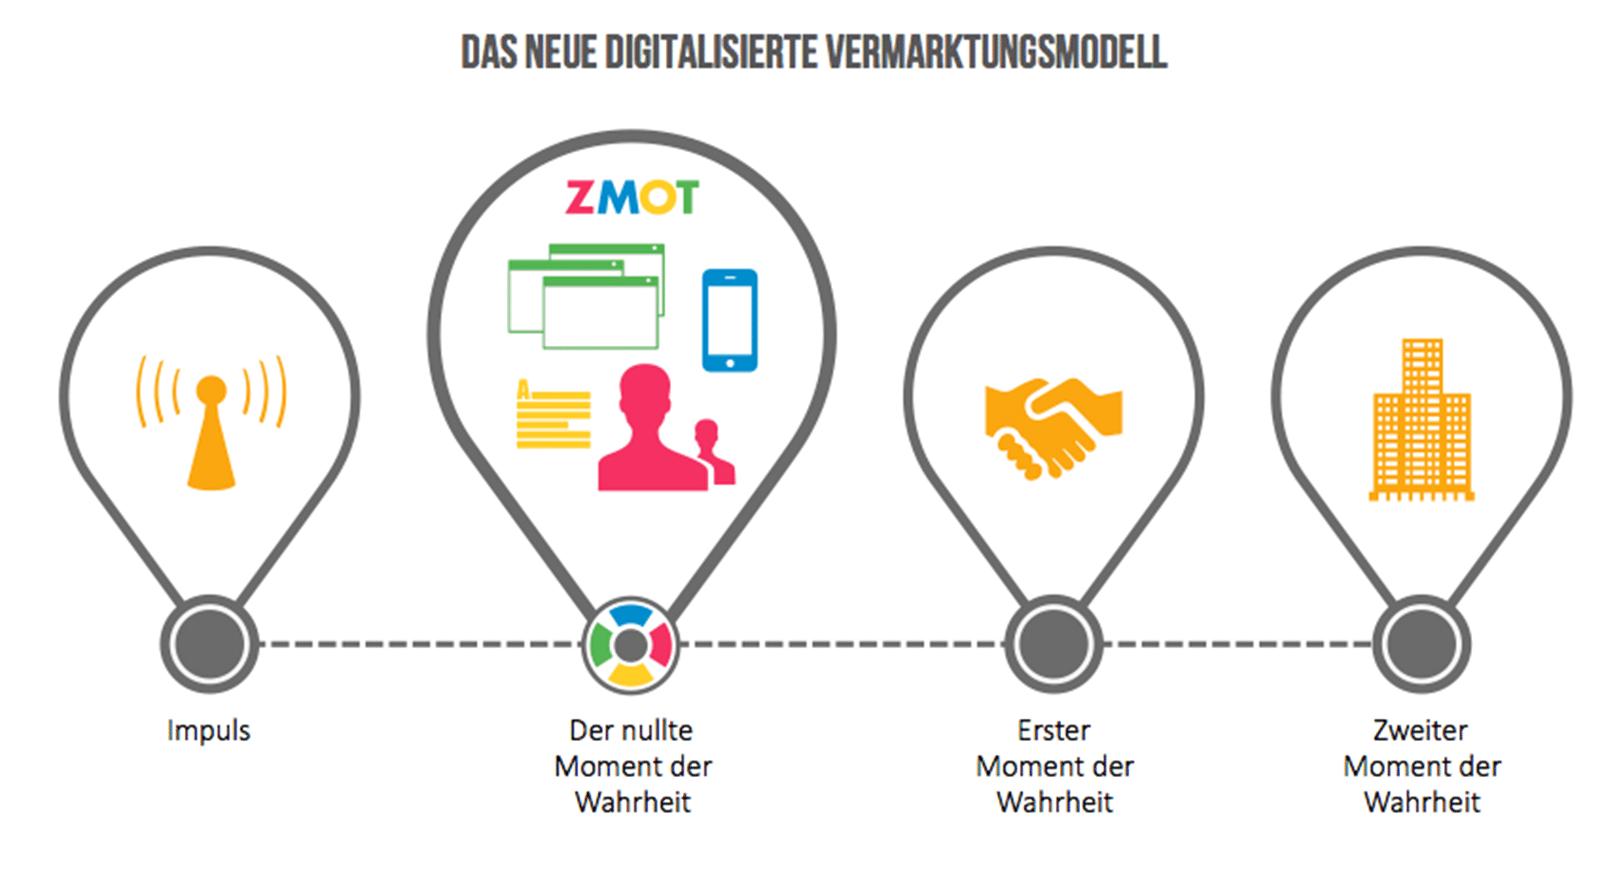 Digitalisiertes Vermarktungsmodell